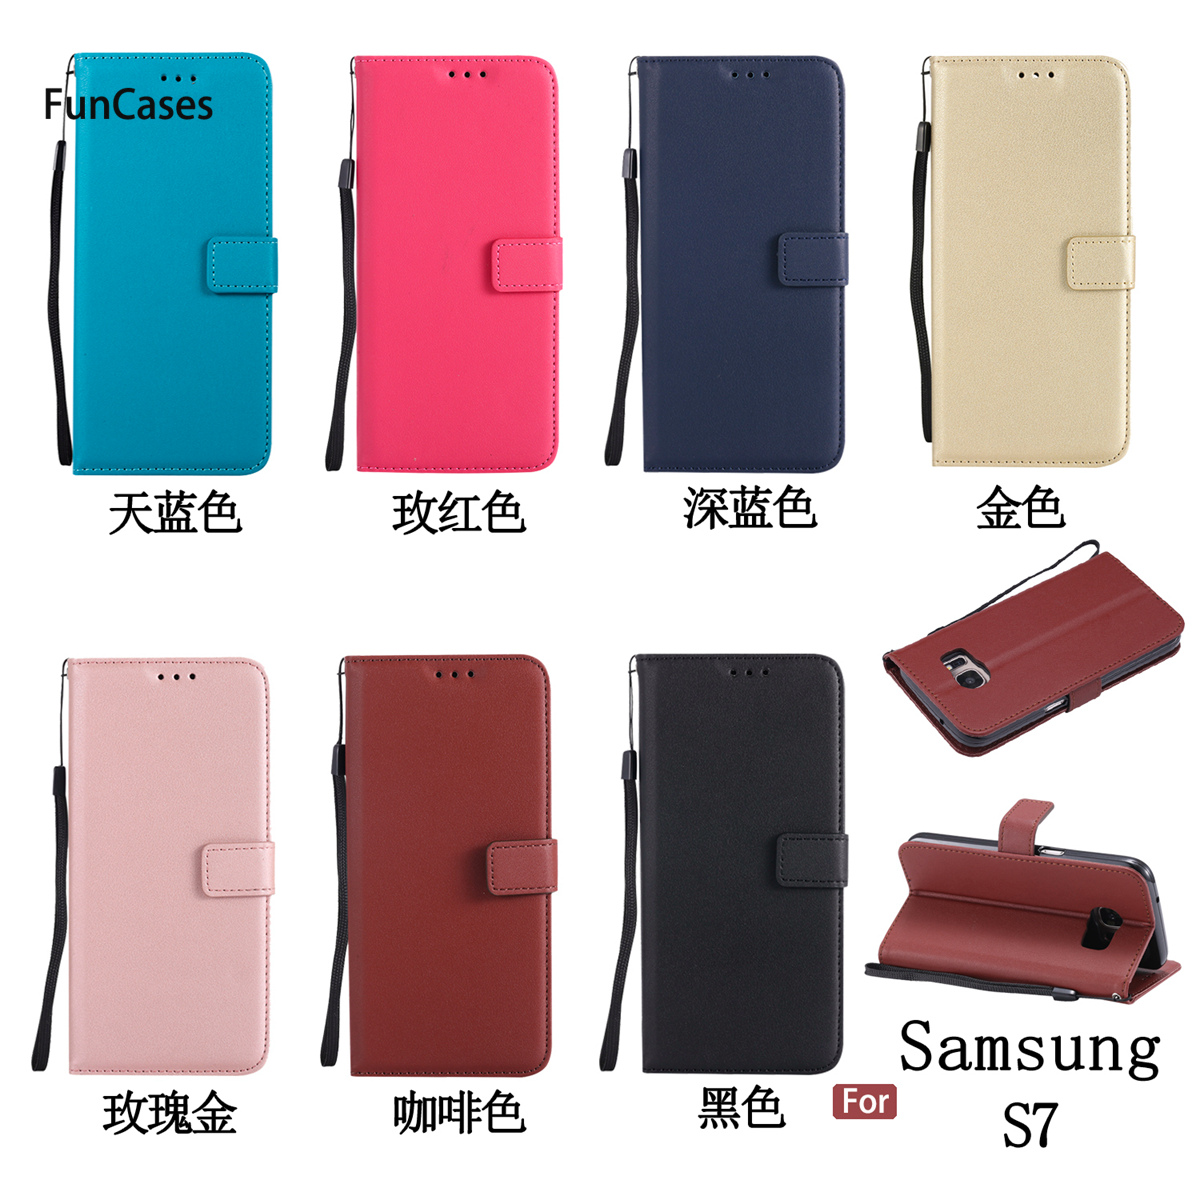 Multicolor PU Leather Case sFor Estojo Samsung S7 Card slot Case Para Glitter Back Cover For Samsung Galaxy G930 Ajax Cellular